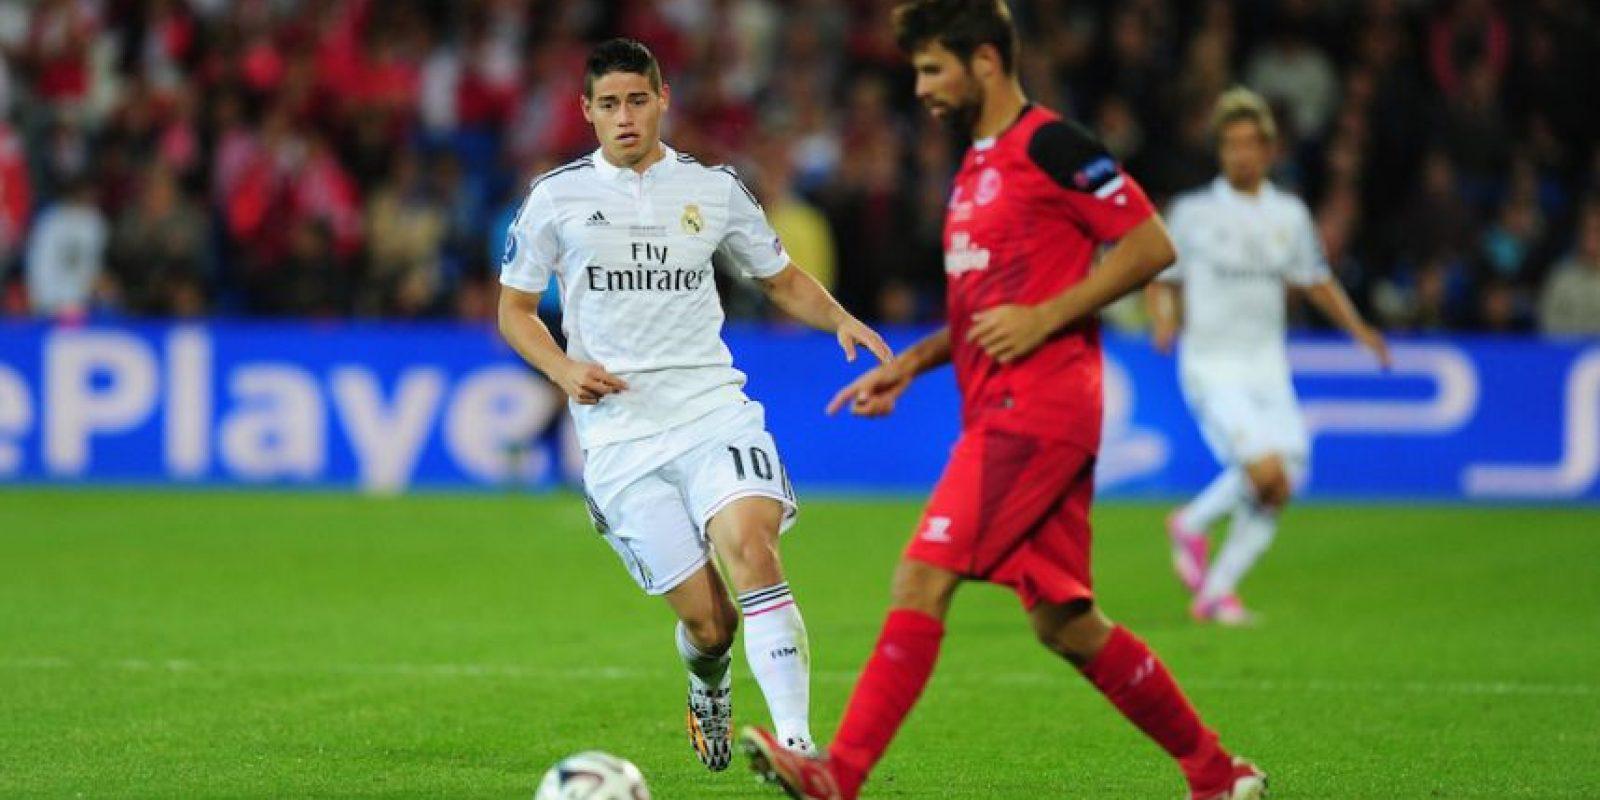 James Rodríguez contra el Sevilla en la Supercopa de la UEFA. Foto:Getty Images